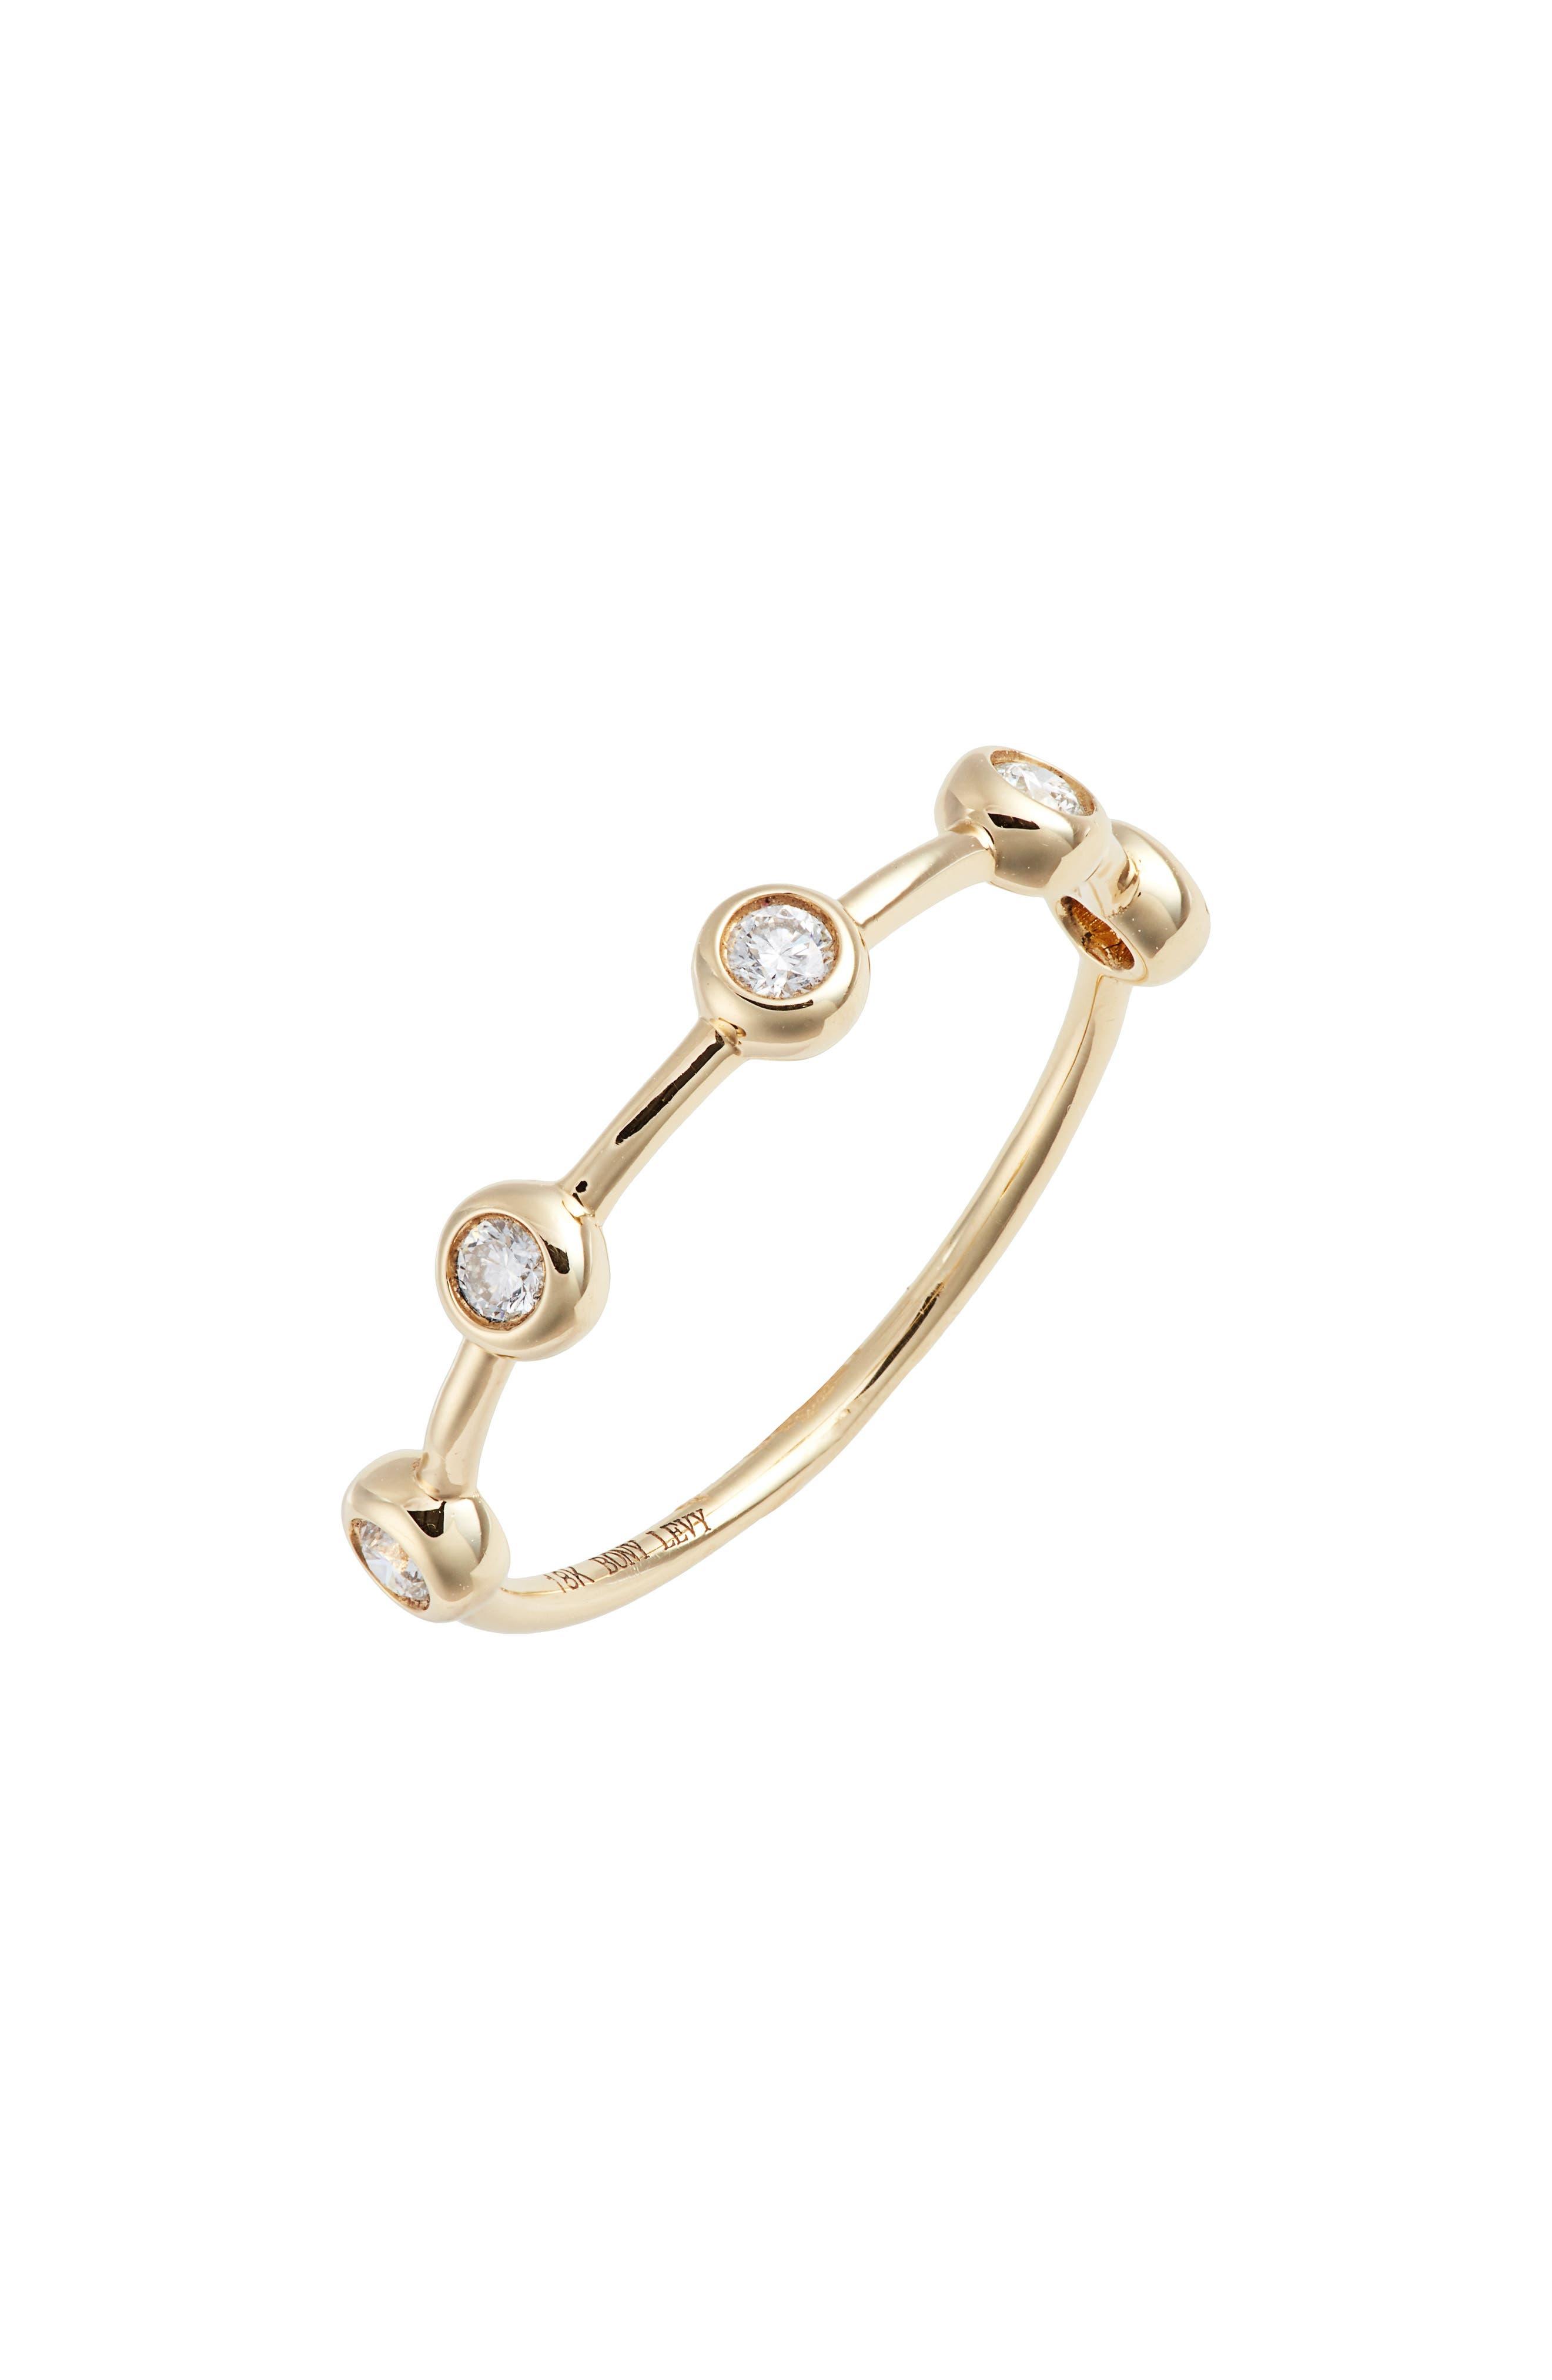 Monaco Bezel Diamond Ring,                             Main thumbnail 1, color,                             YELLOW GOLD/ DIA